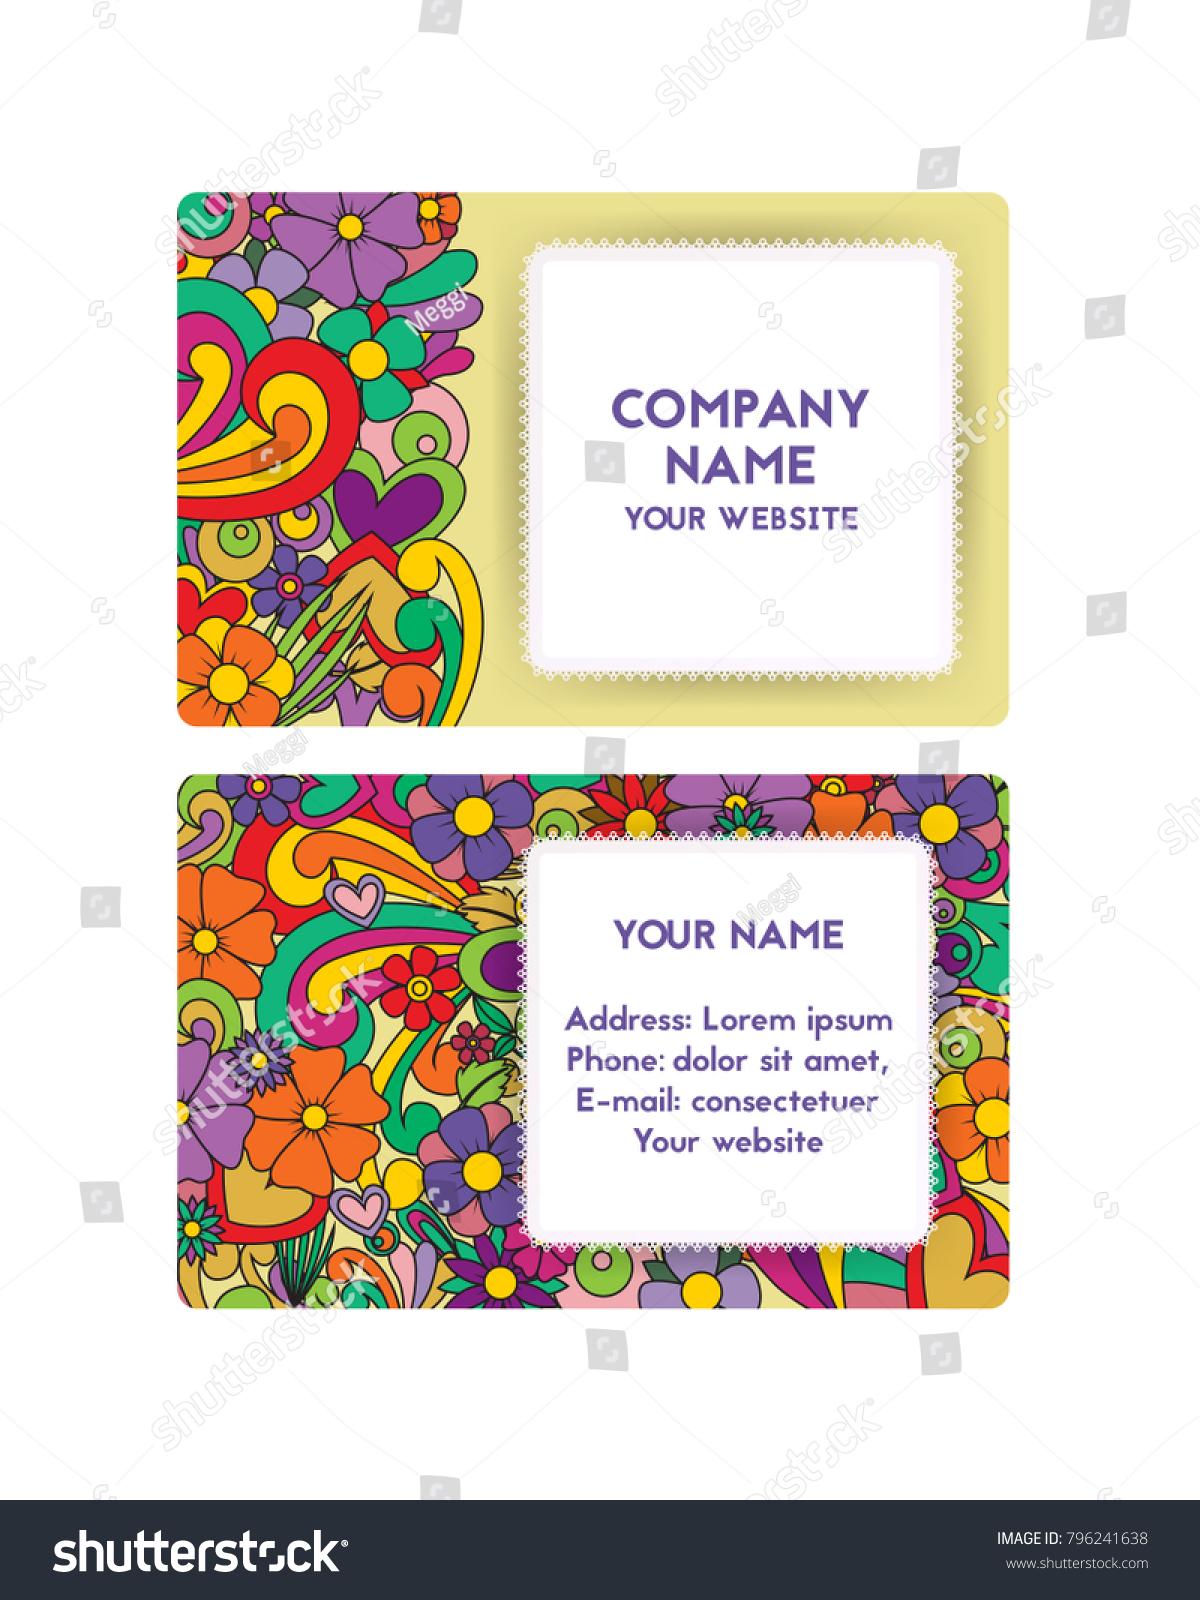 Template Business Card Organization Festivals Company Stock ...